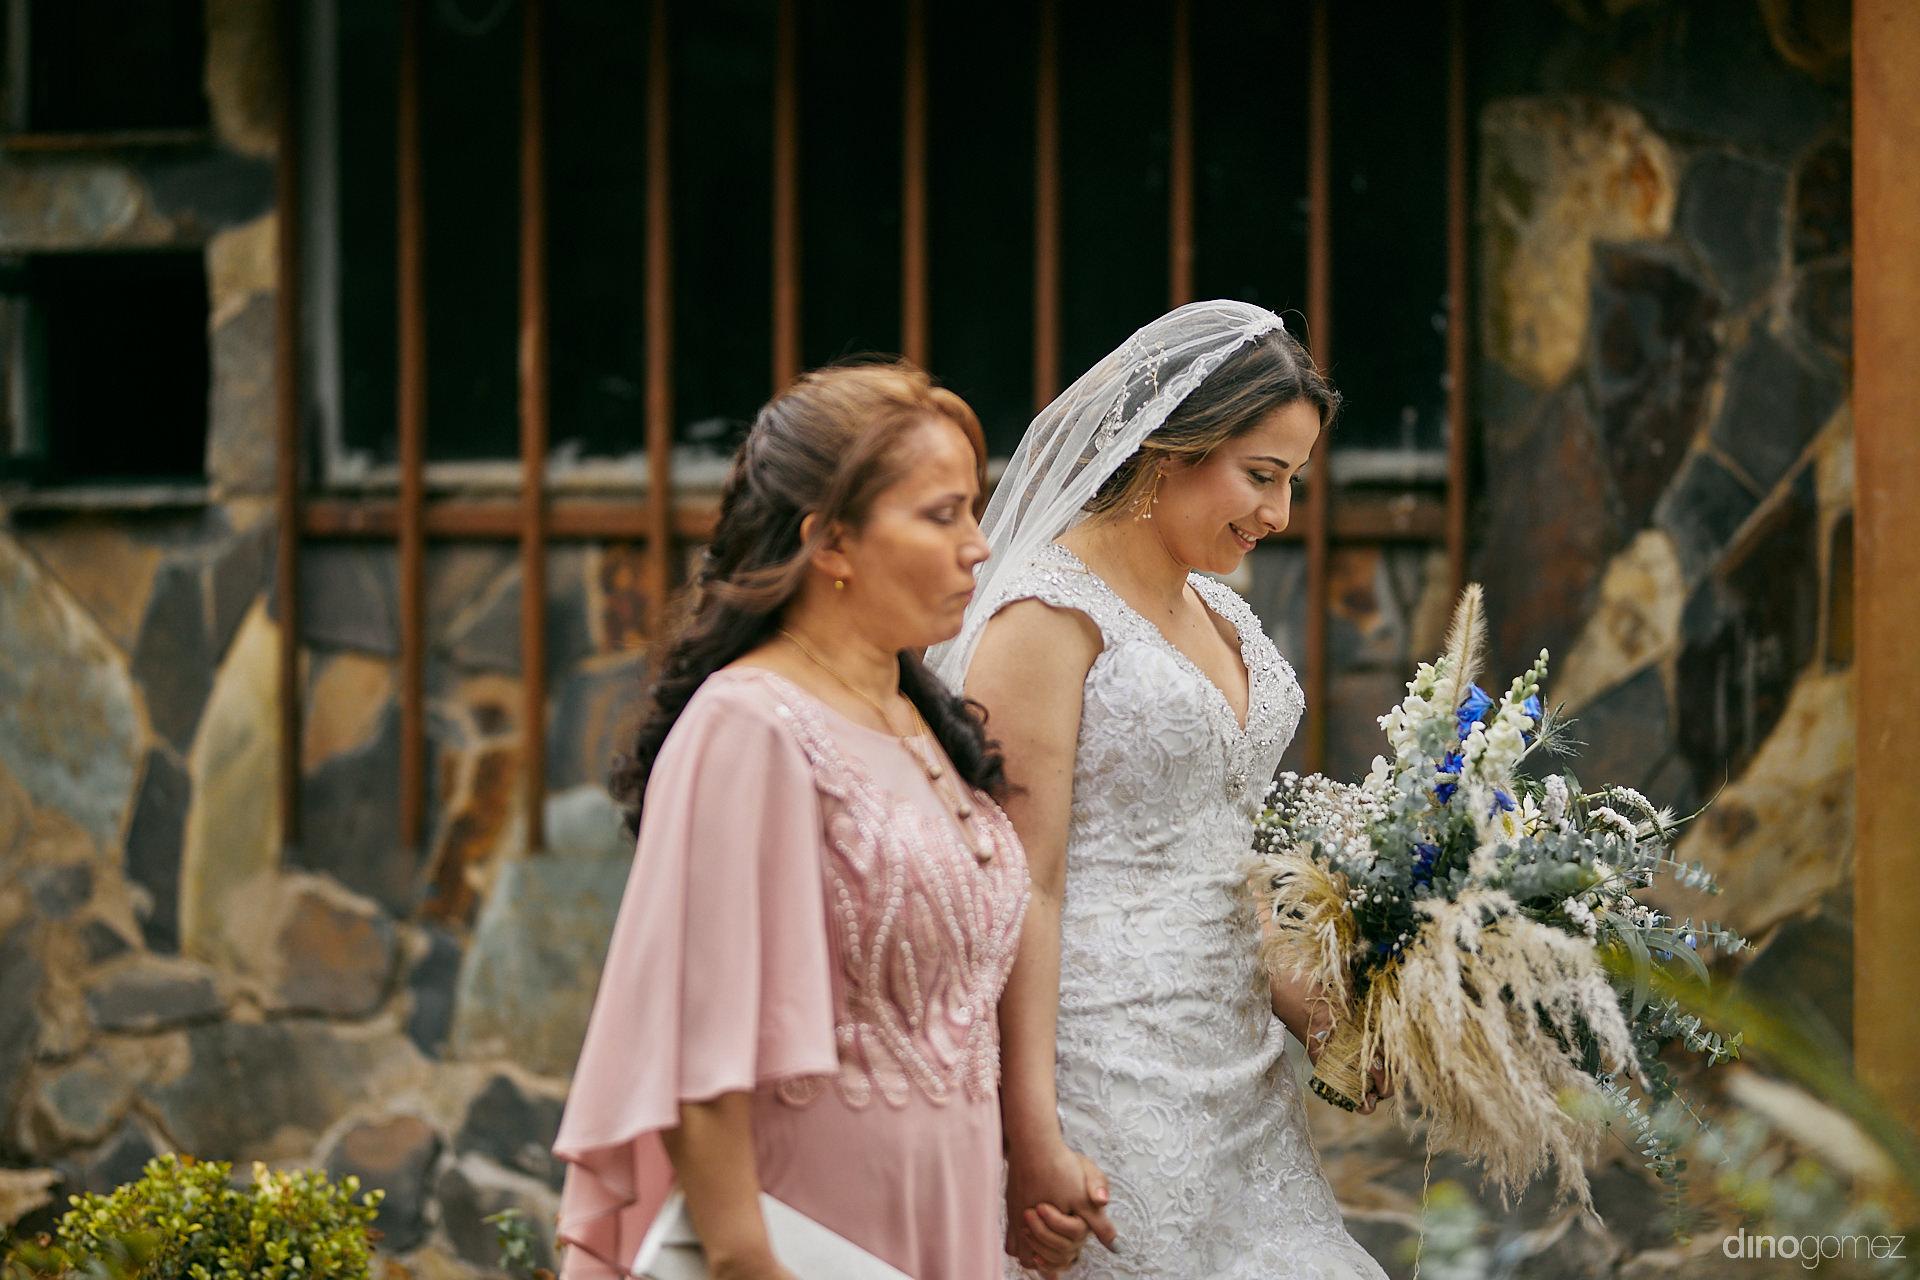 001 - Diy Budget Destination Weddings Can Be Prety Too!